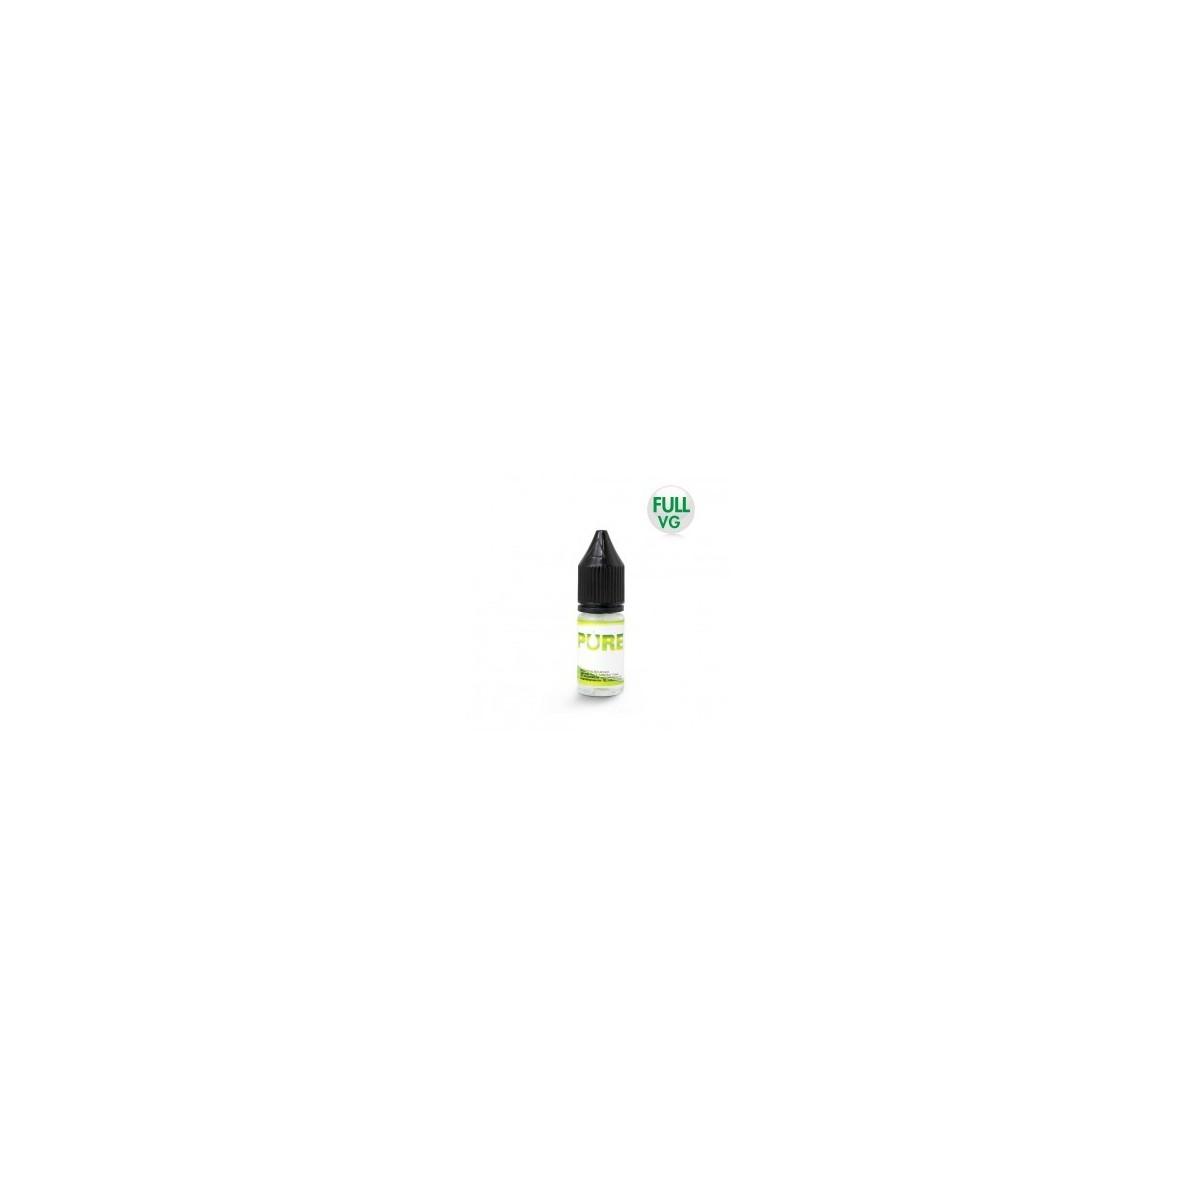 Glicerina Vegetale (VG) 10ml